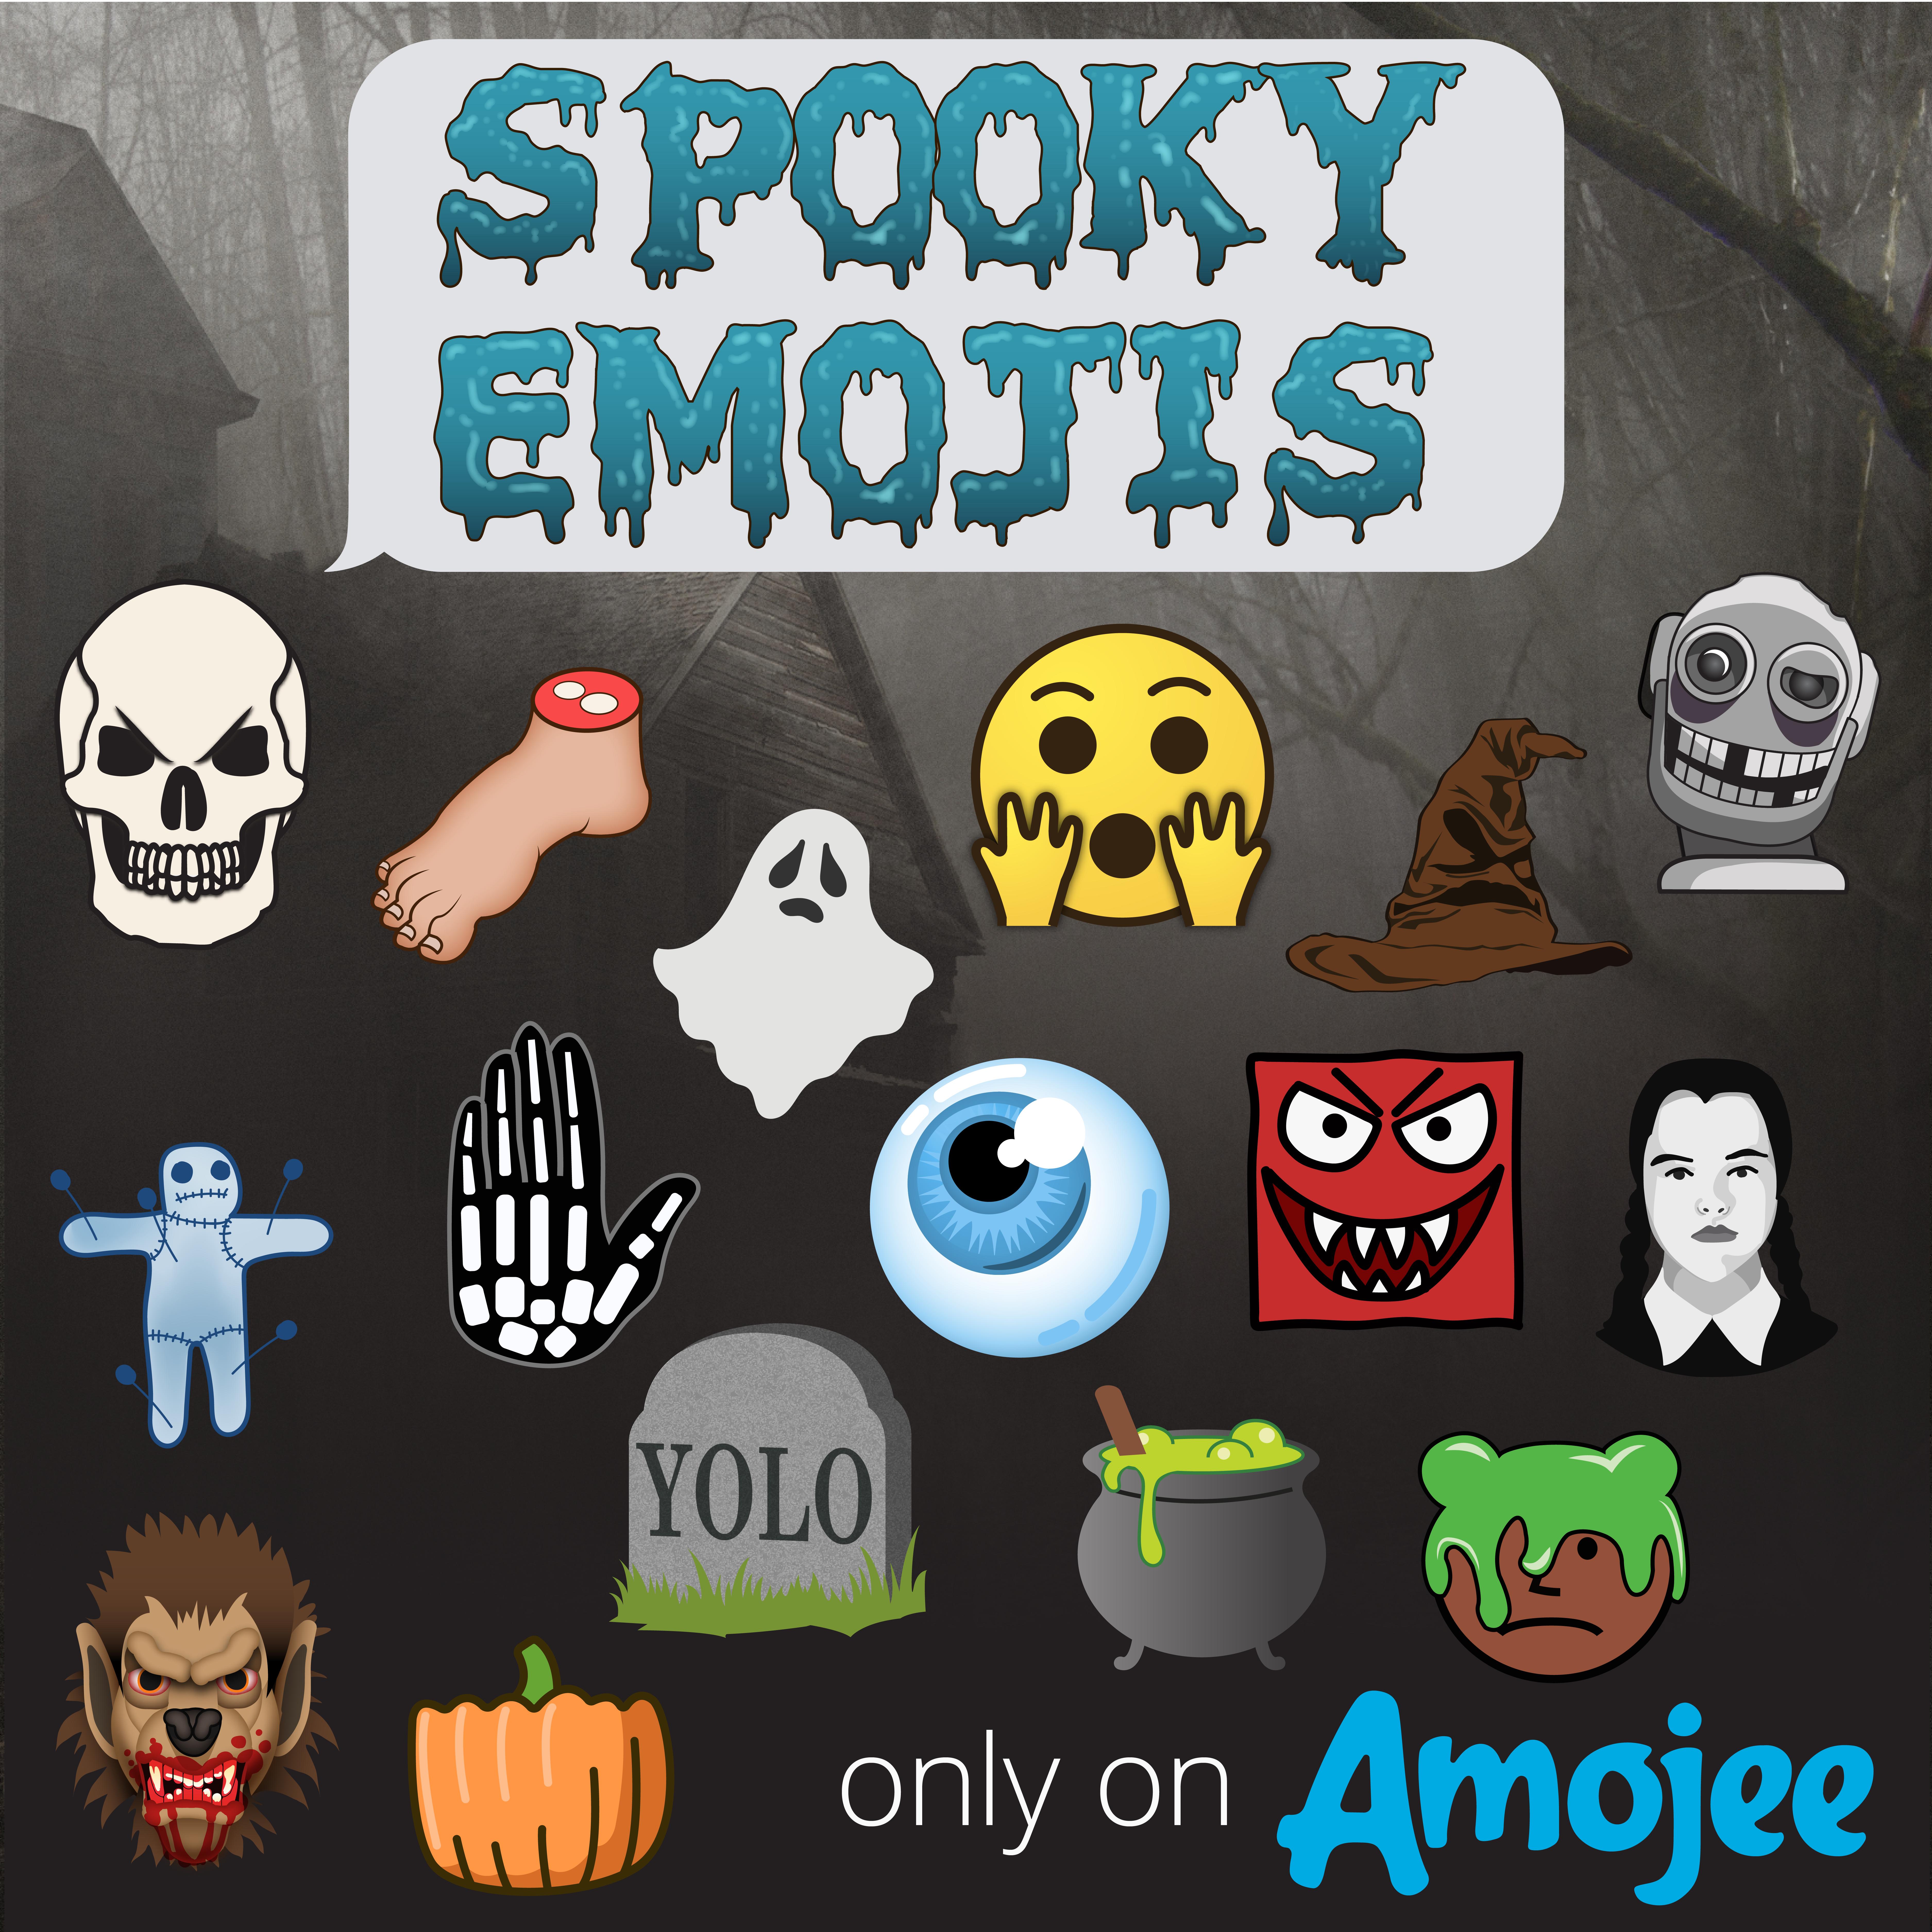 Pin By Amojee App On Emoji Only At Amojee